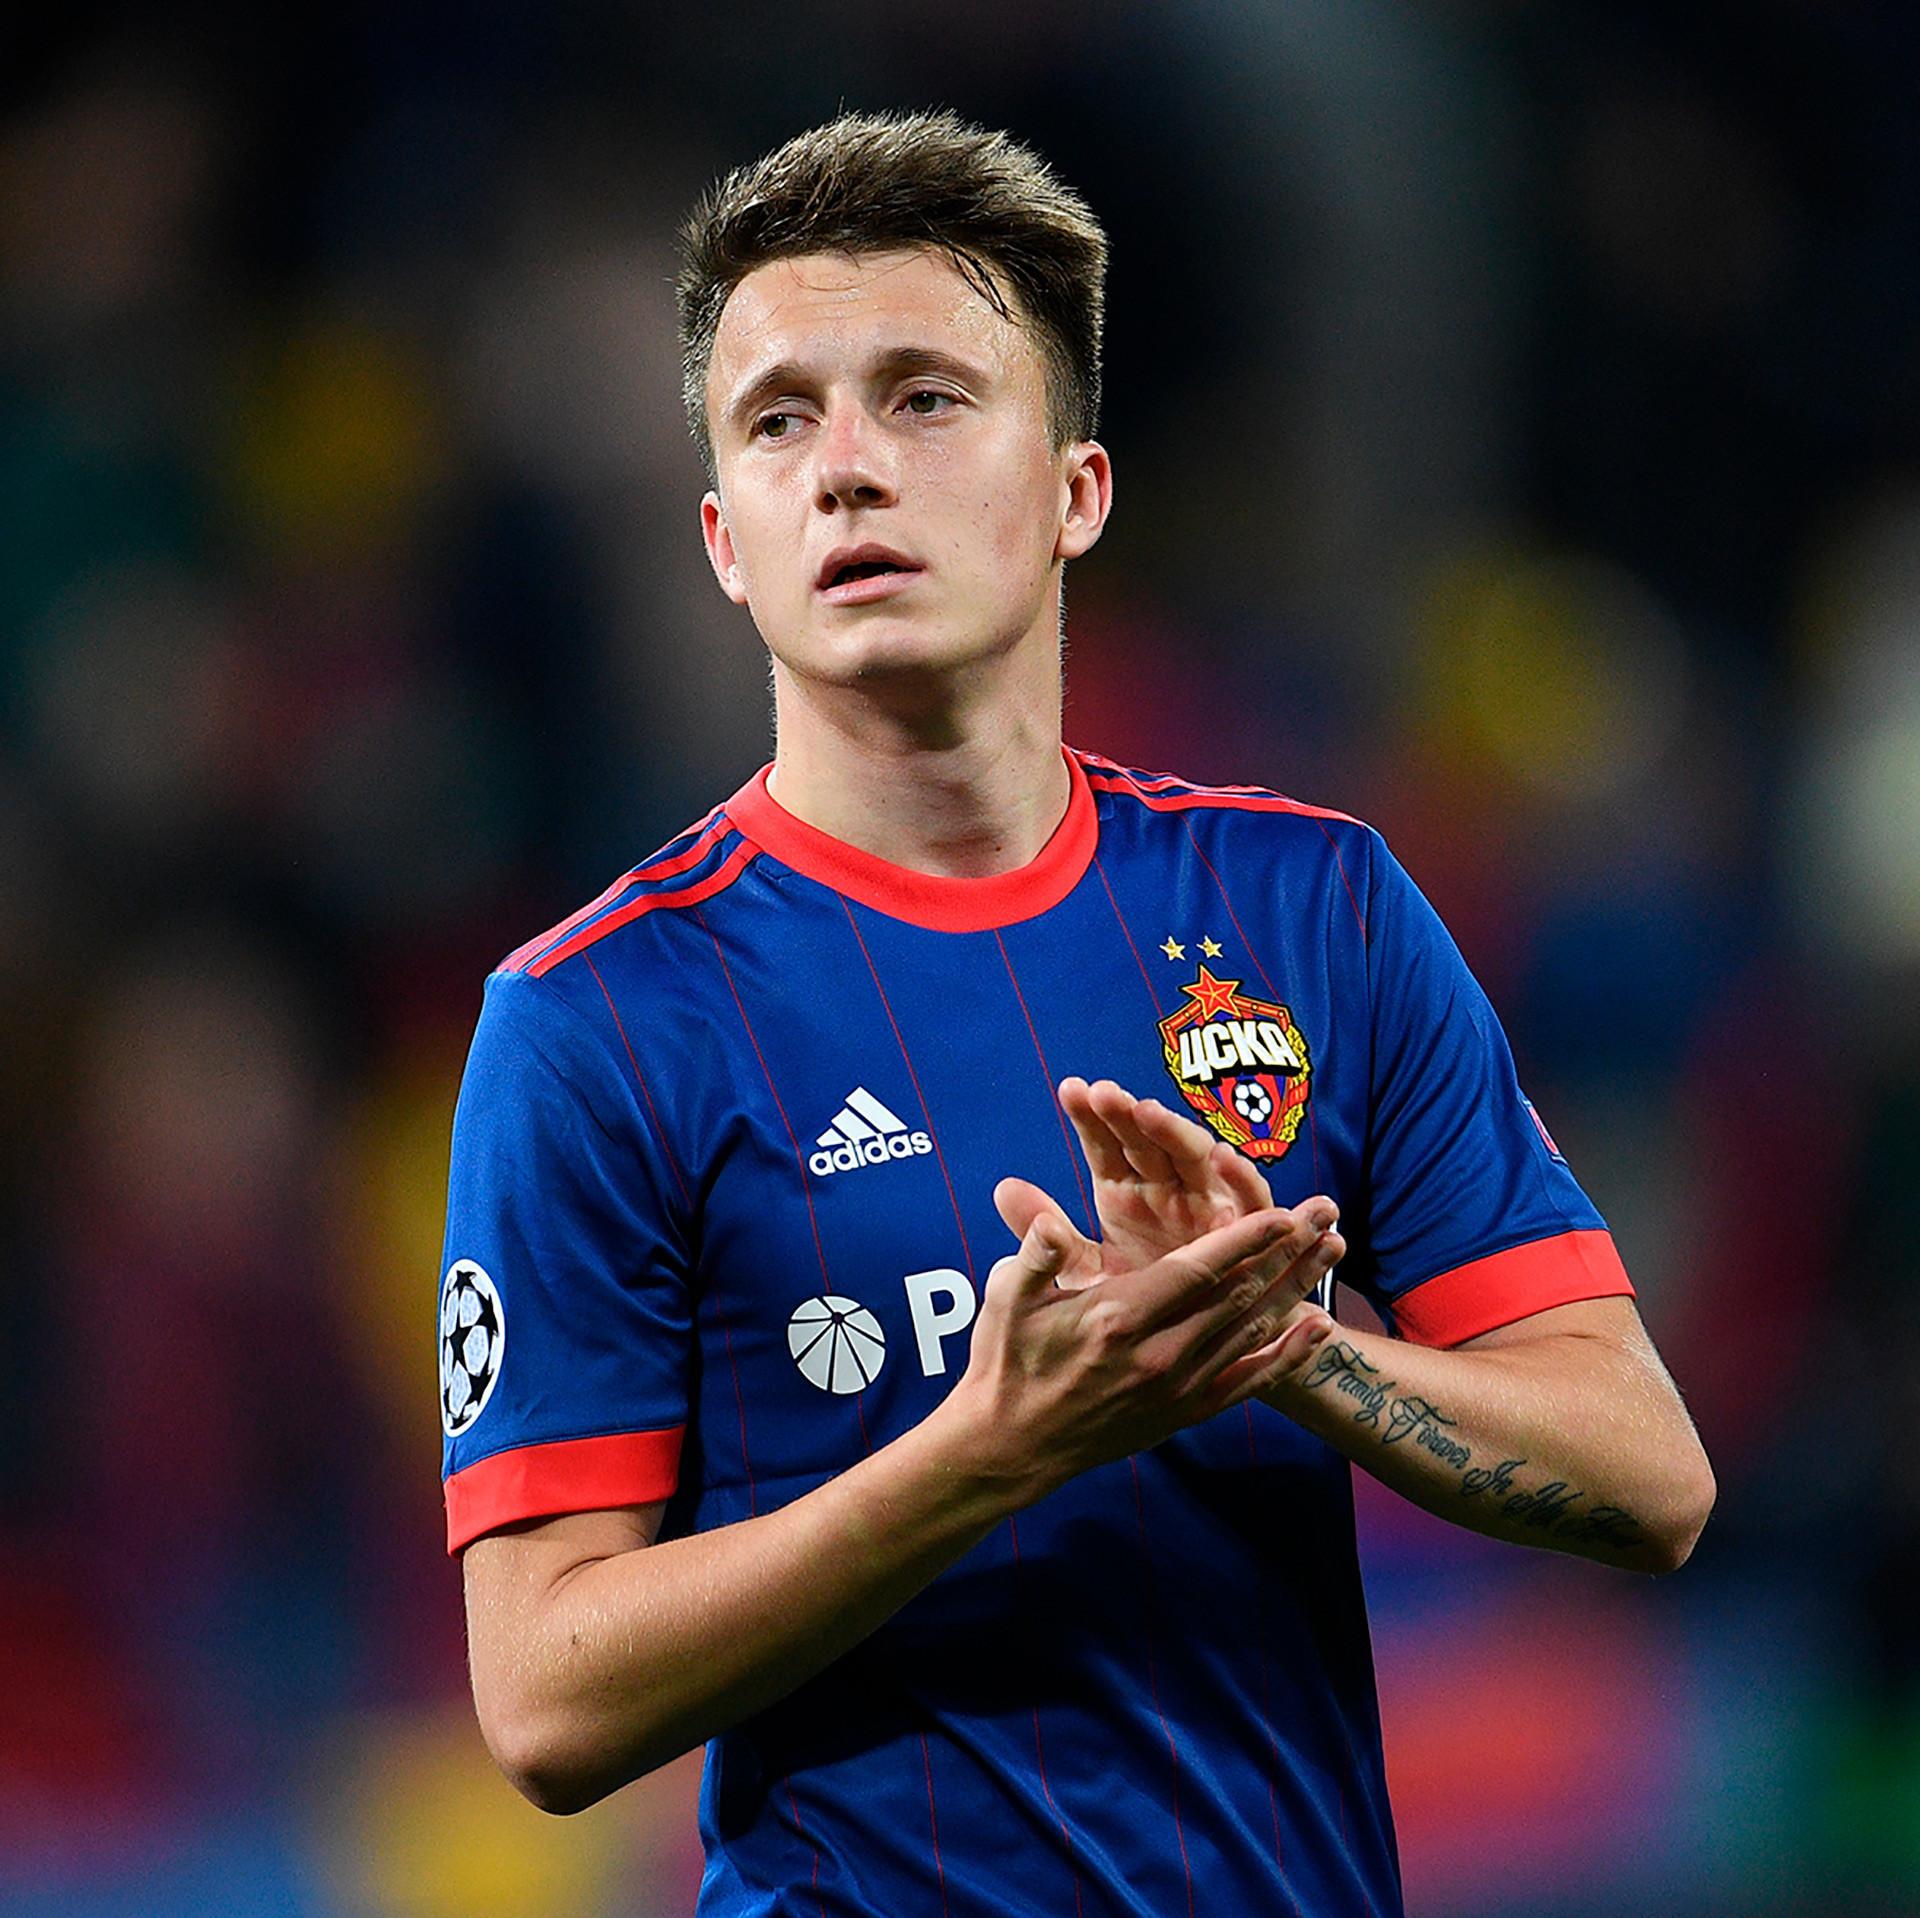 Gelandang CSKA Moskow Aleksandr Golovin yang sempat diincar Arsenal.